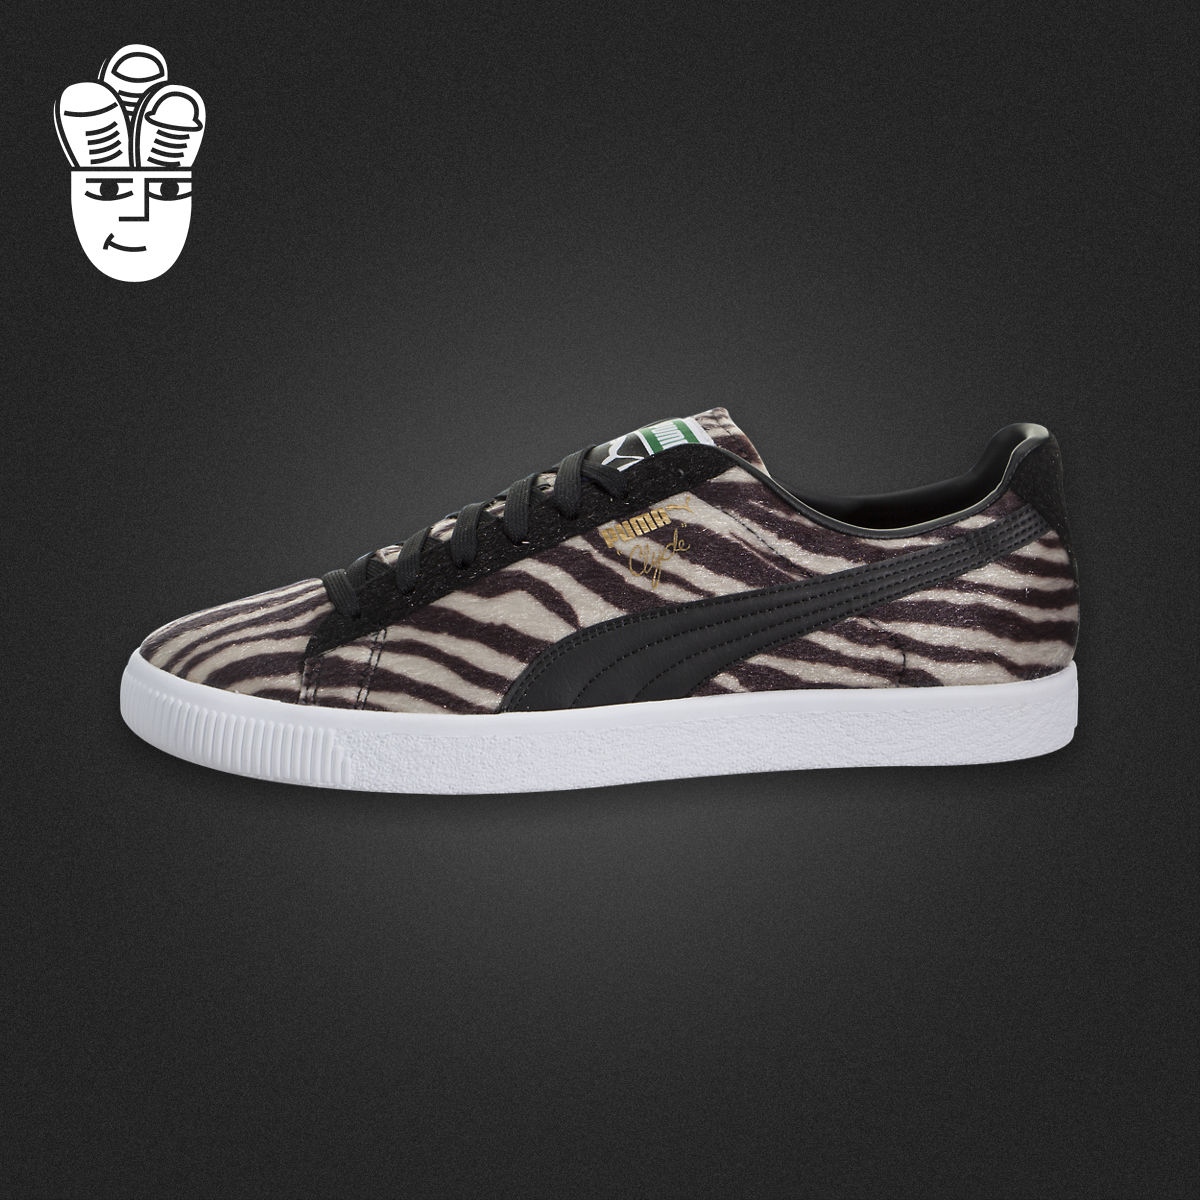 Puma Clyde Suits 彪马男鞋 低帮复古板鞋 运动休闲鞋